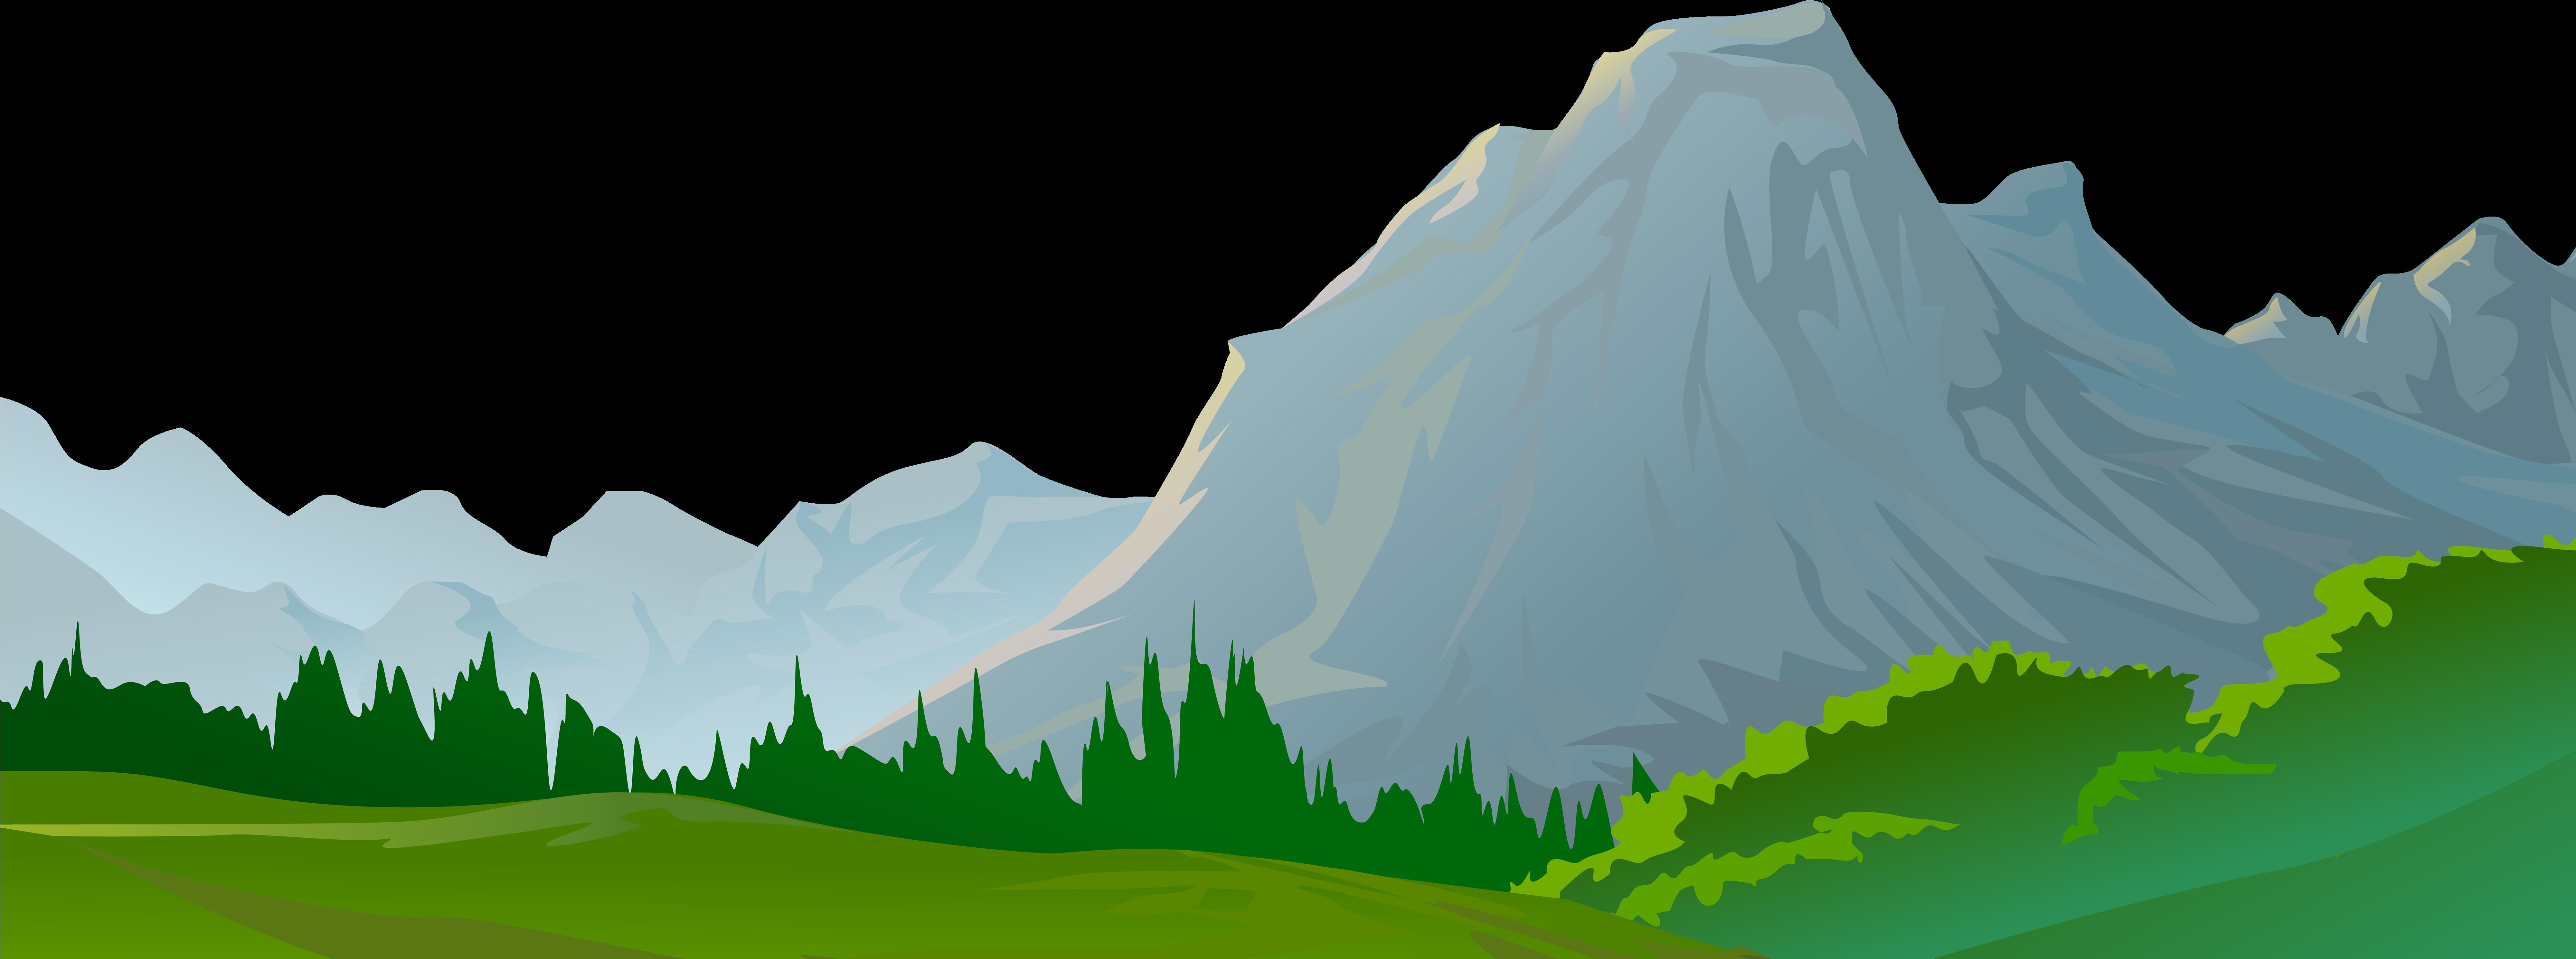 Mountain decorative transparent image. Clipart mountains ground